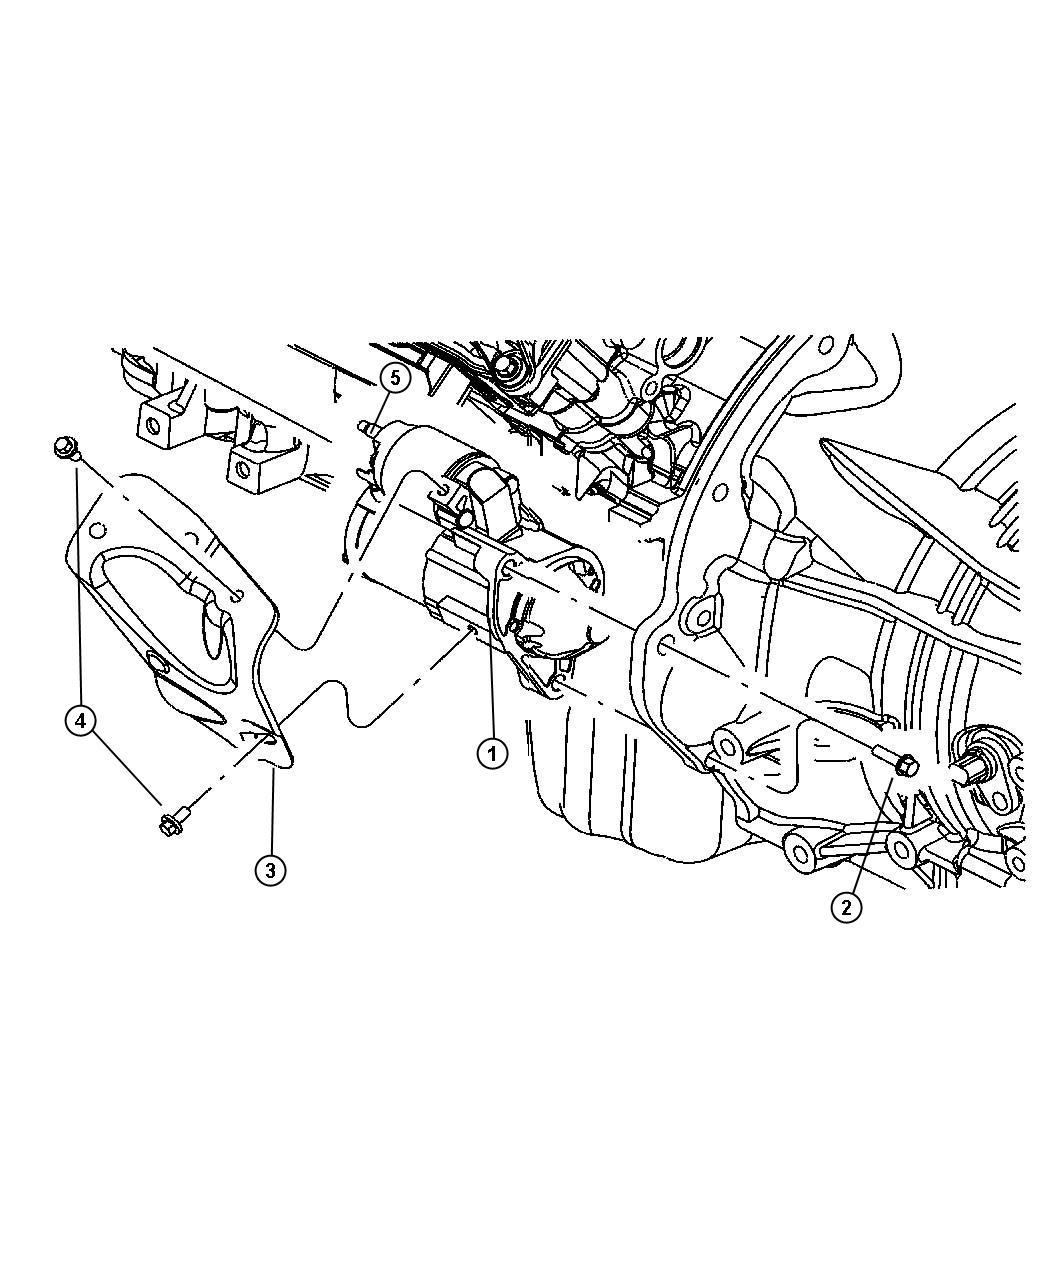 2009 Jeep Grand Cherokee Starter  Engine  Maintenance